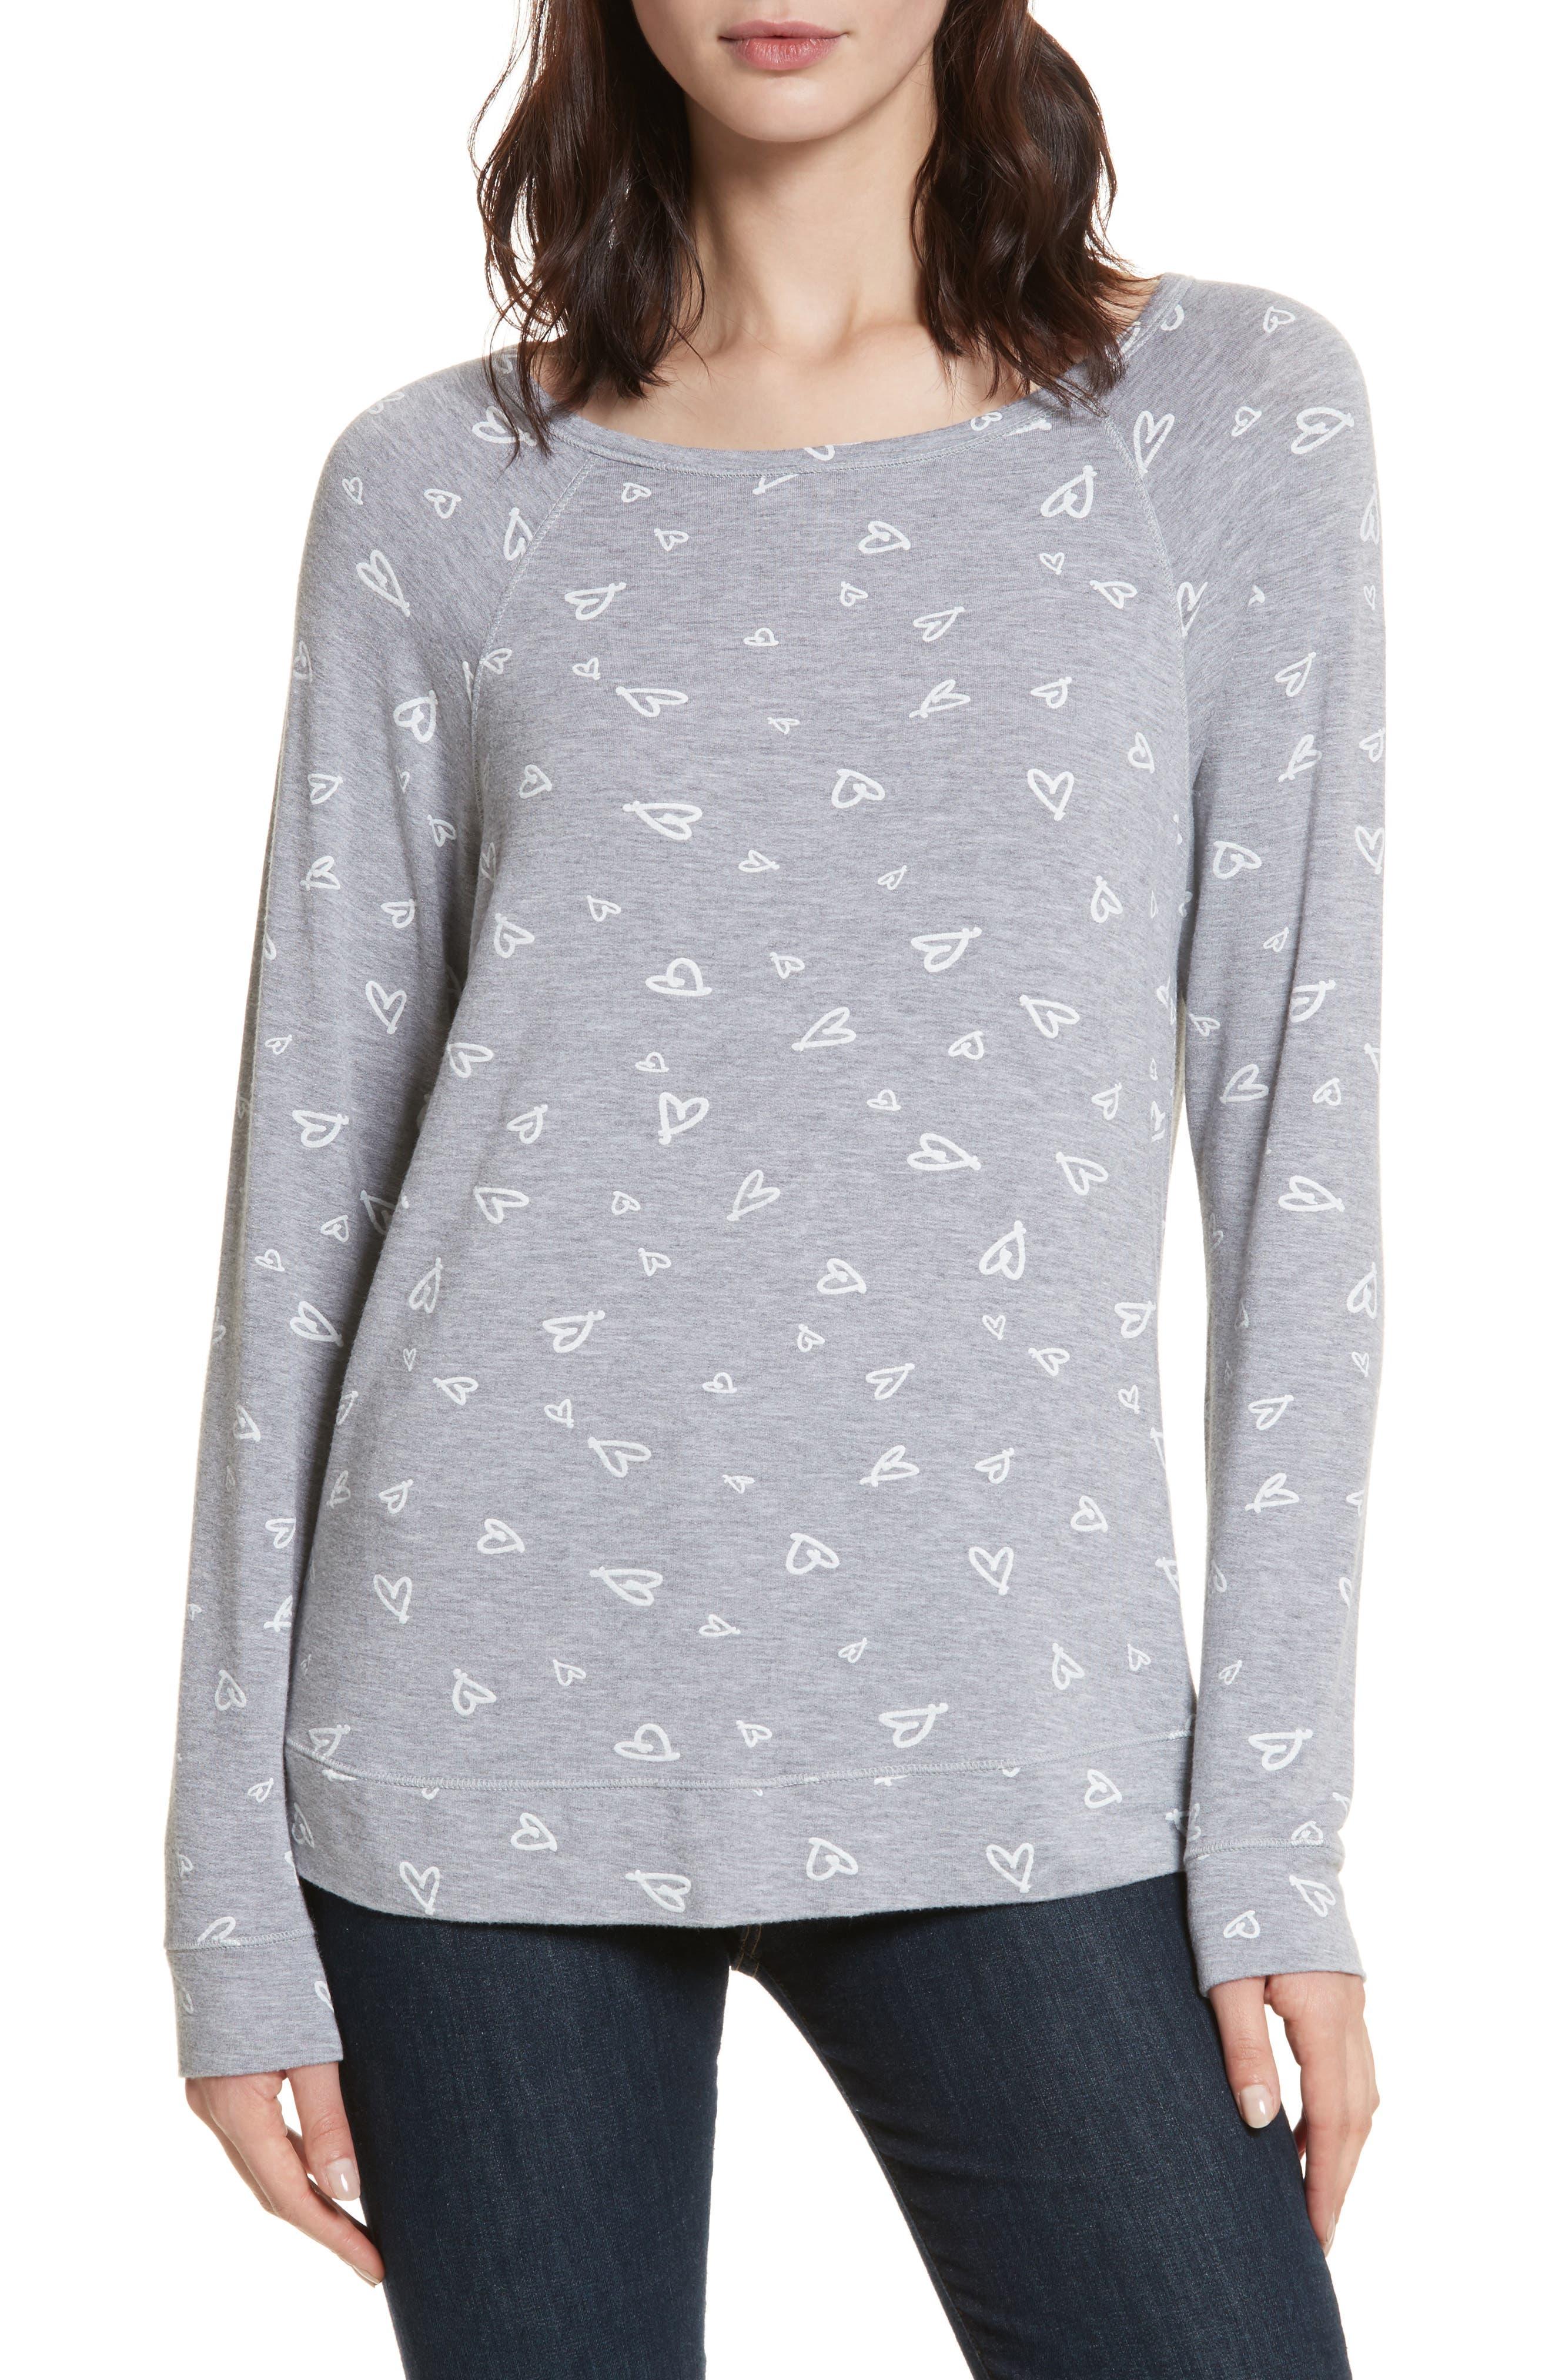 Annora B Print Cotton & Modal Blend Sweatshirt,                             Main thumbnail 1, color,                             071